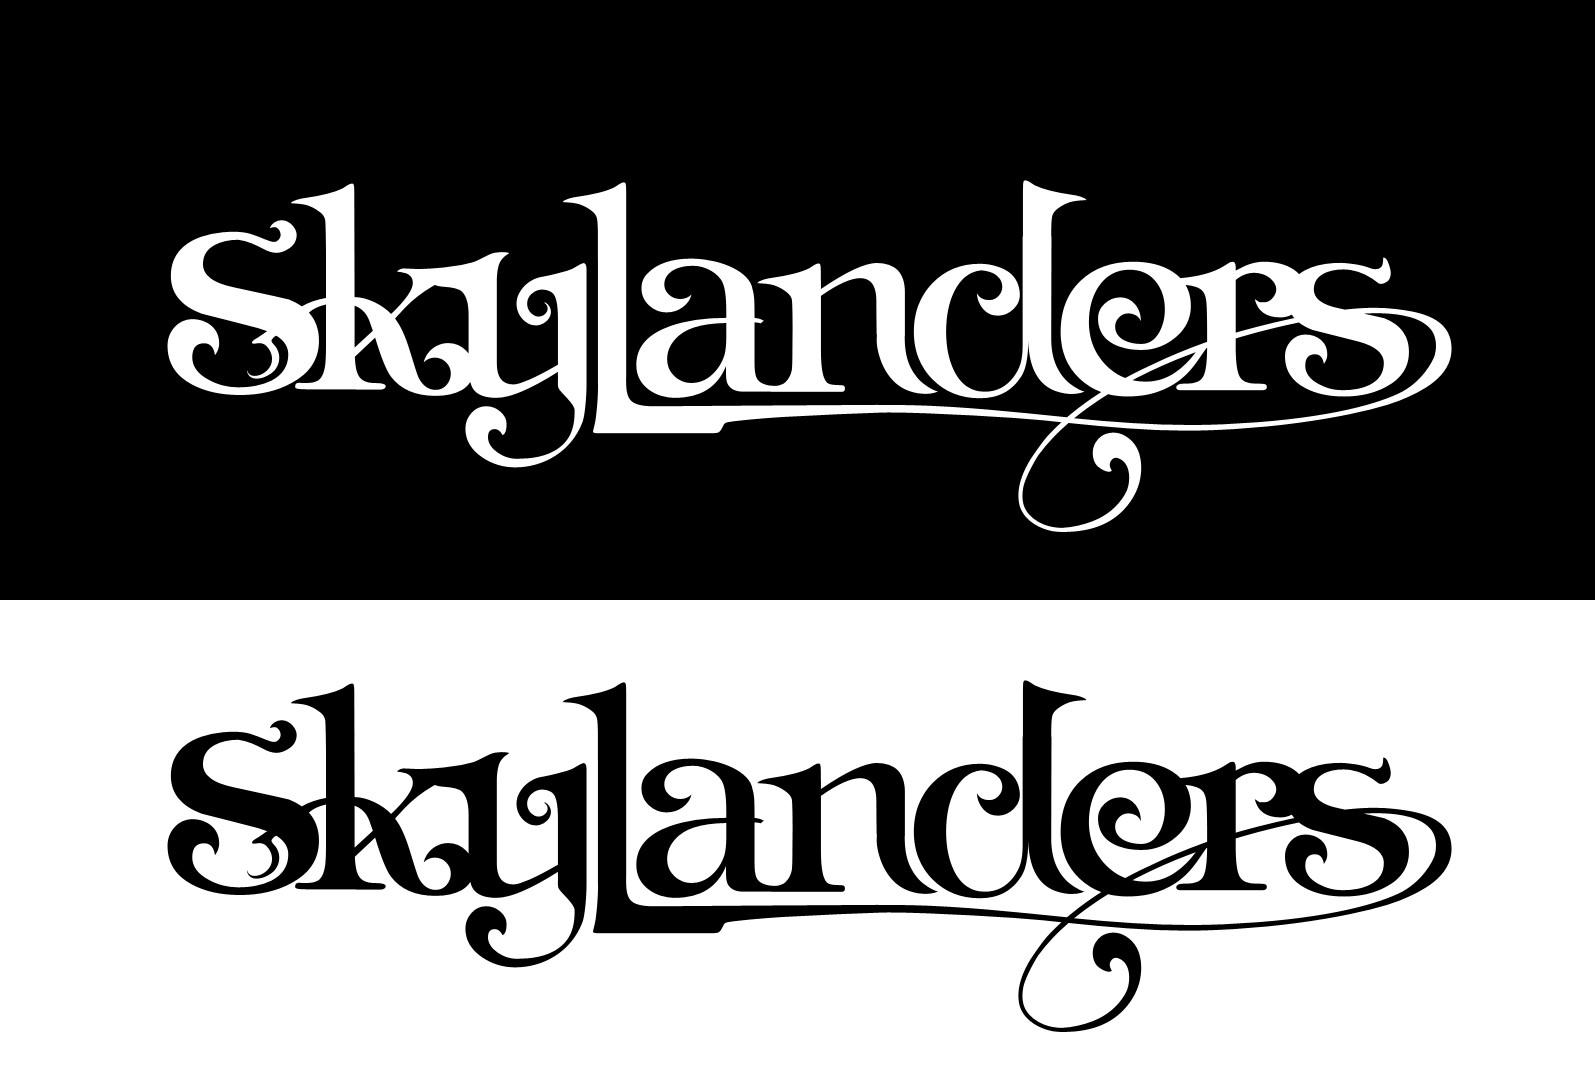 Jeff christy logotype skylanders